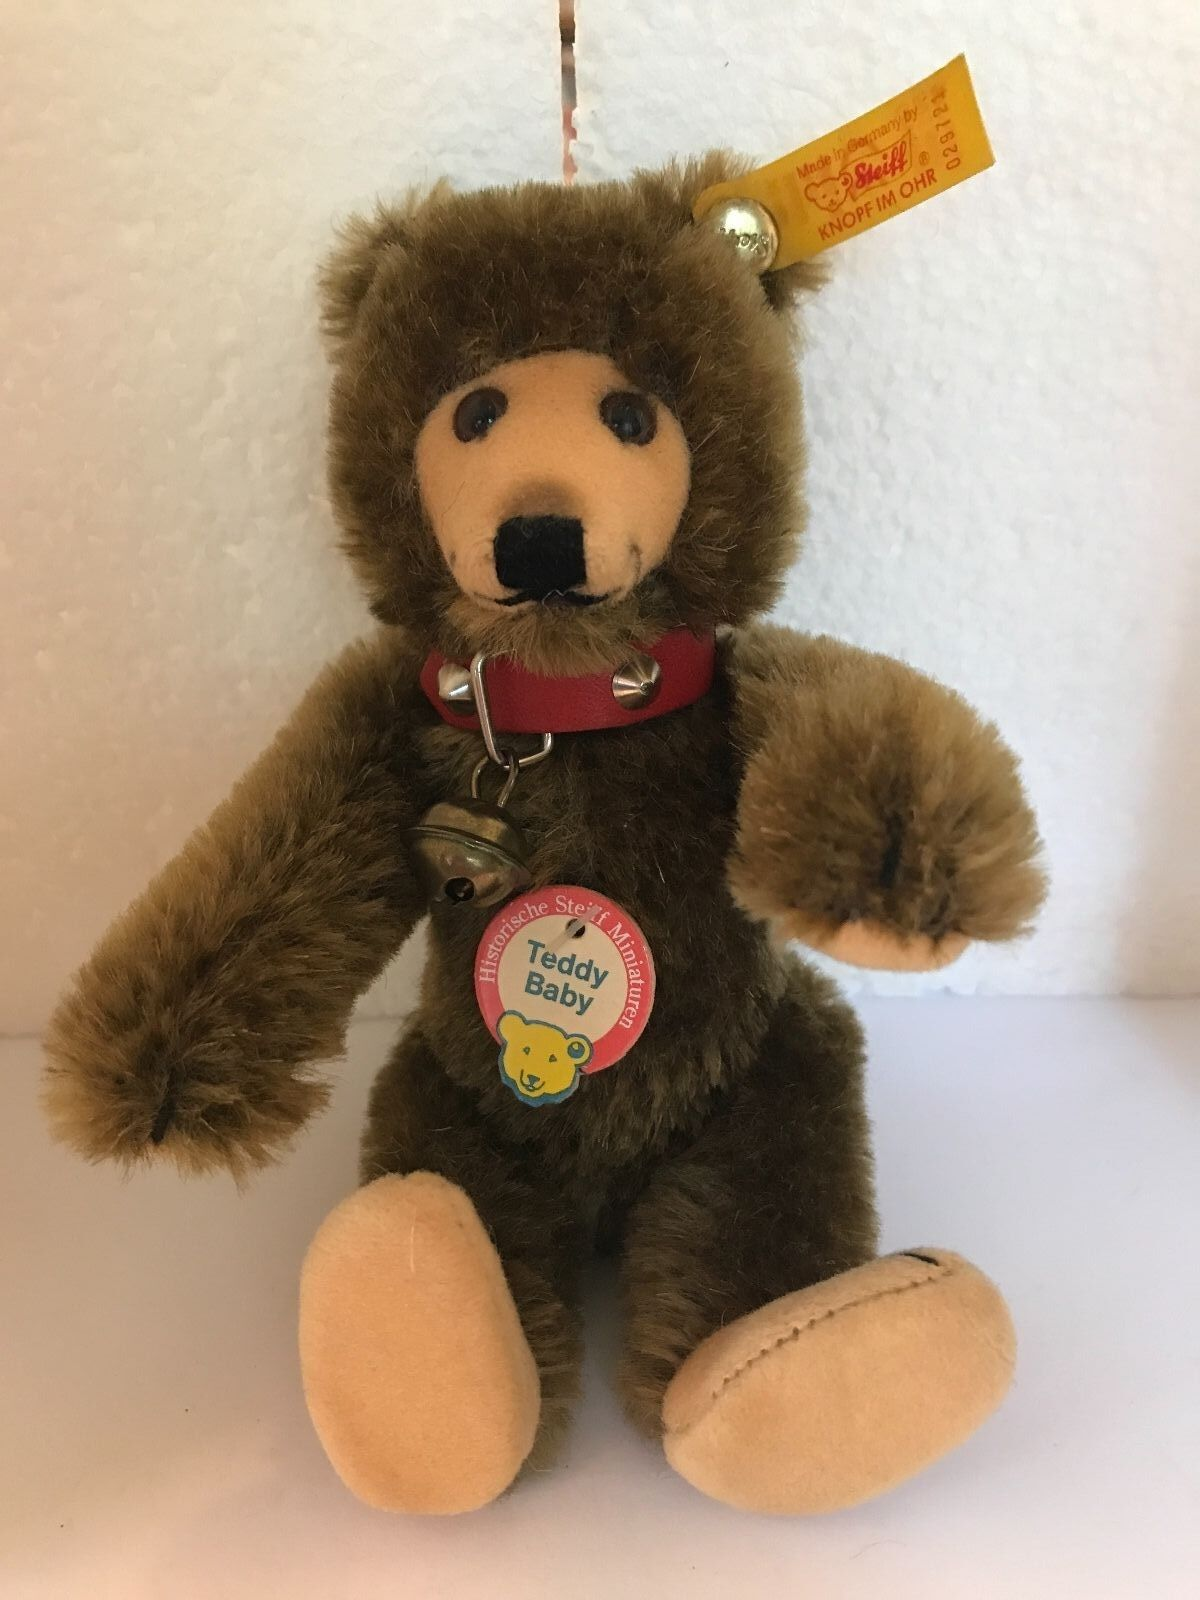 ️STEIFF TEDDY bambino orso  HISTORIC MINIATURE  029721  1992-98   Marronee 6  ️